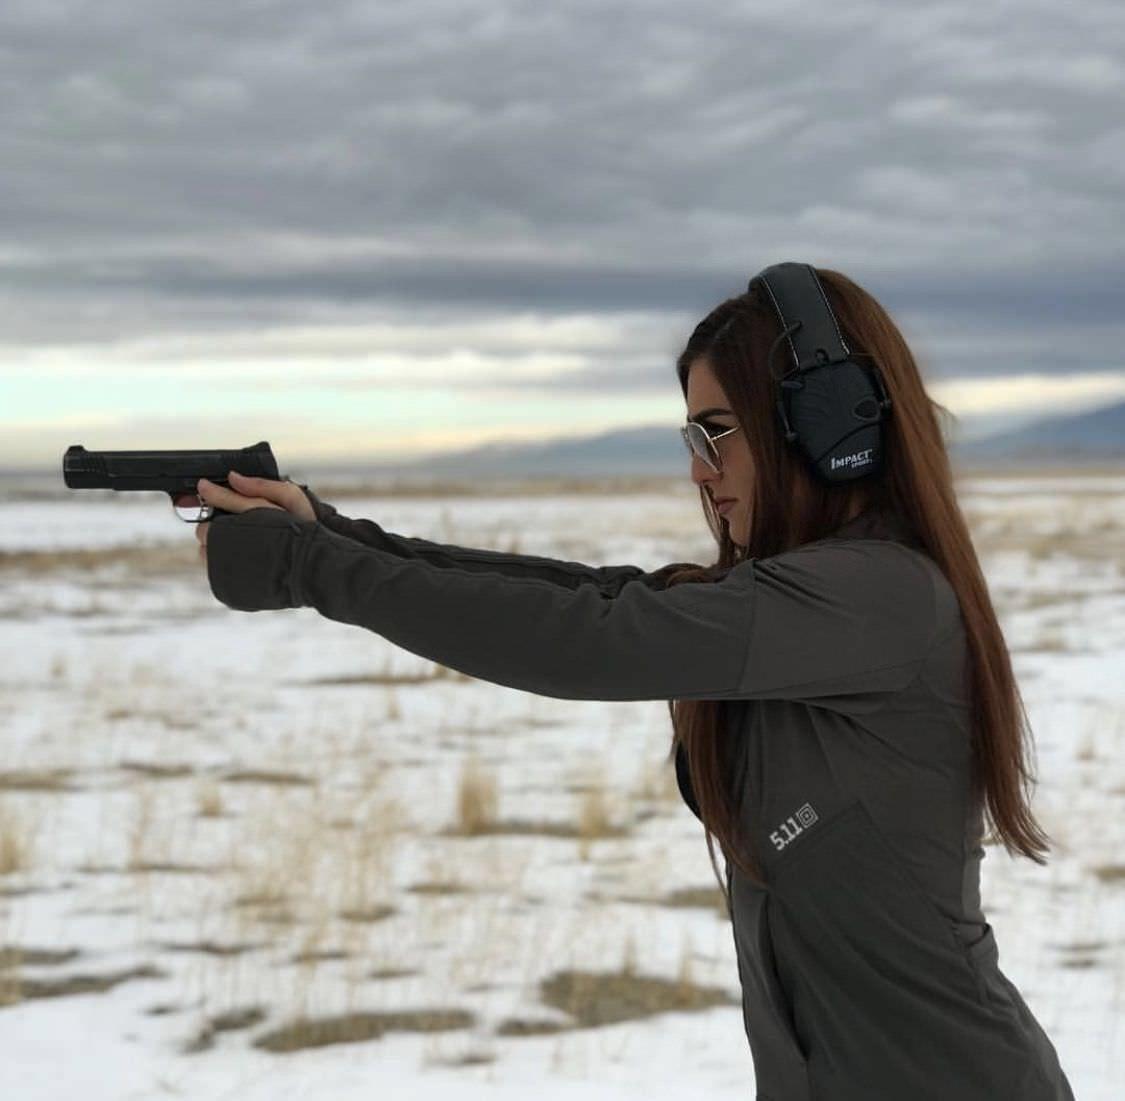 Картинки девушки брюнетки с ружьем